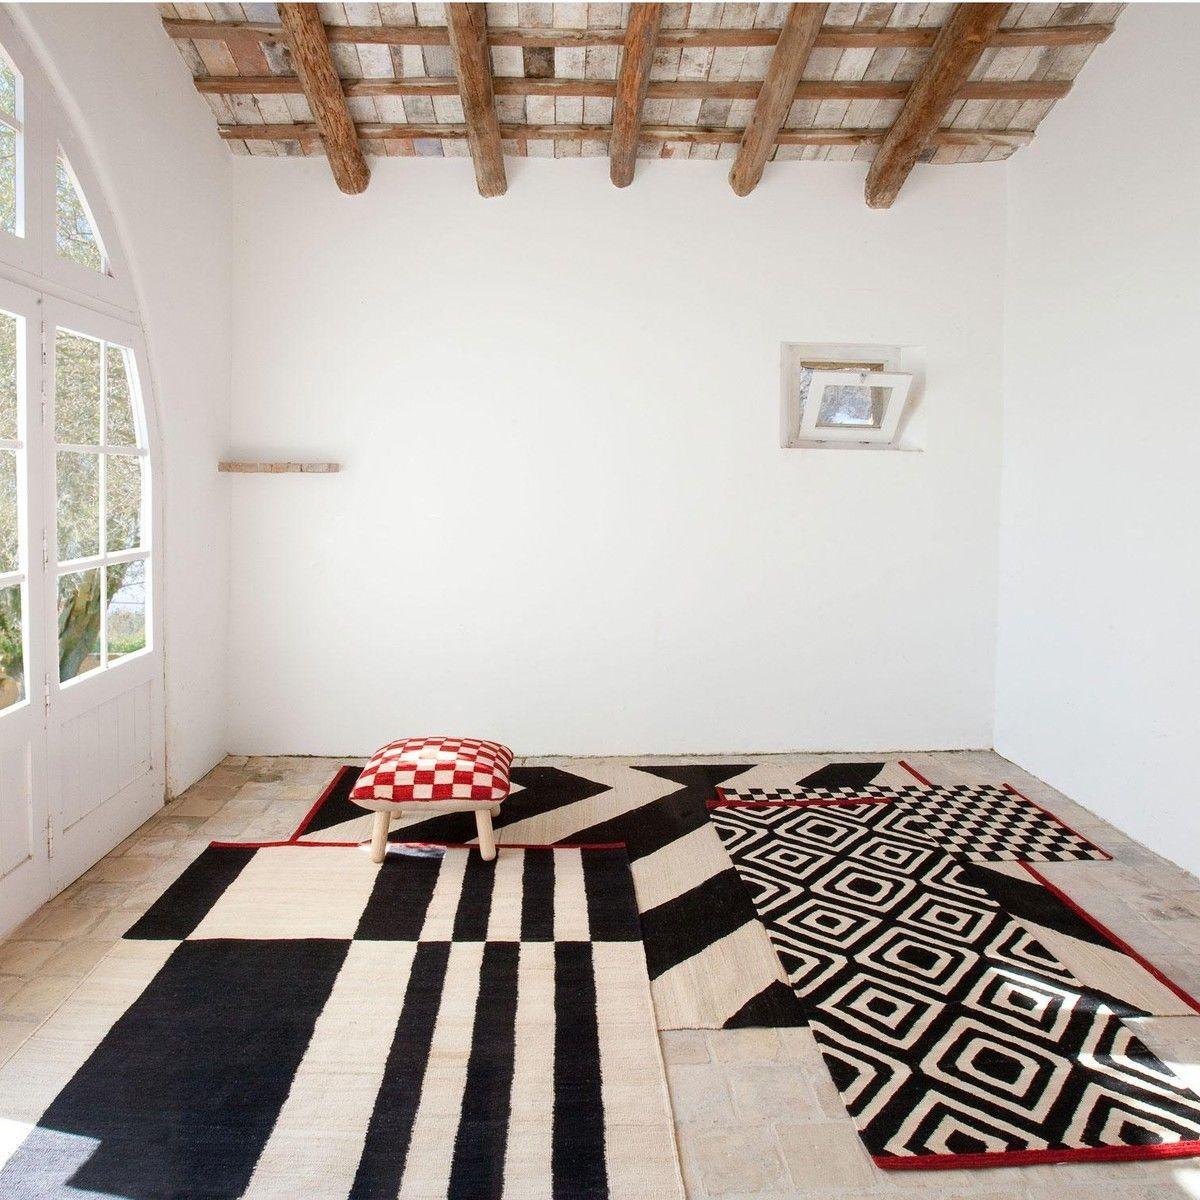 M233lange Pattern 45 Kilim Wool Carpet Nanimarquina  : none1200x1200 ID610222 c8f54ef12ea0e077f2e8caa1e42b97d6 from www.ambientedirect.com size 1200 x 1200 jpeg 304kB